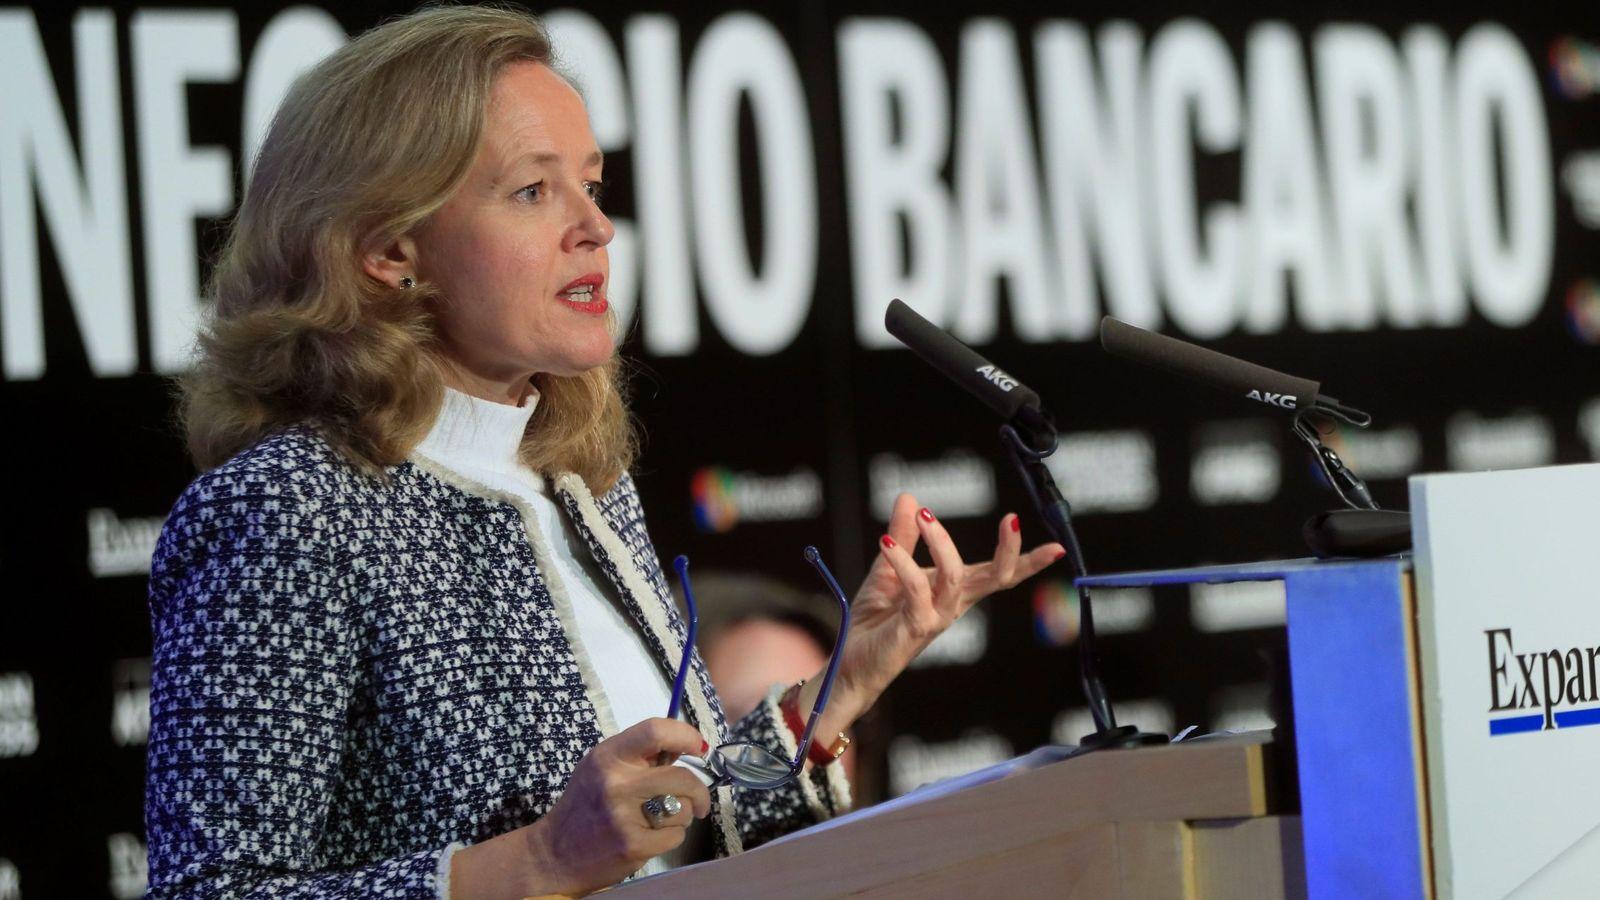 Foto: La ministra de Economía, Nadia Calviño. (EFE)